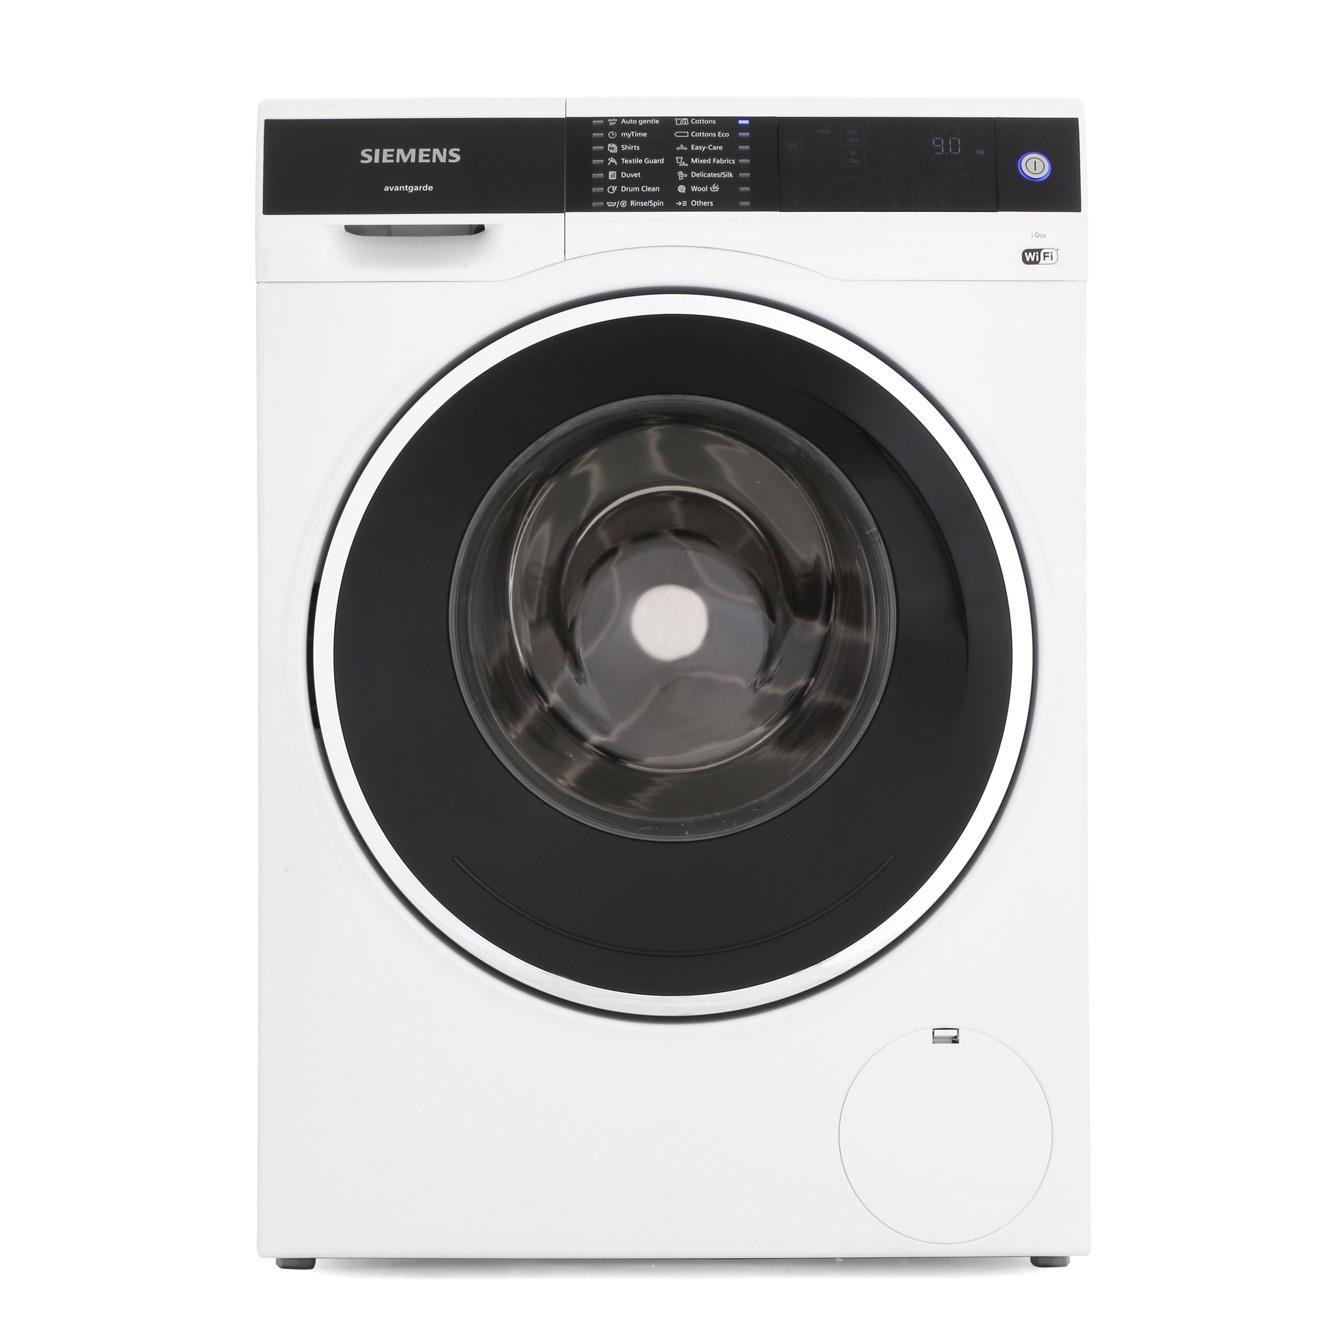 Buy Siemens avantgarde WM4UH640GB Washing Machine ...